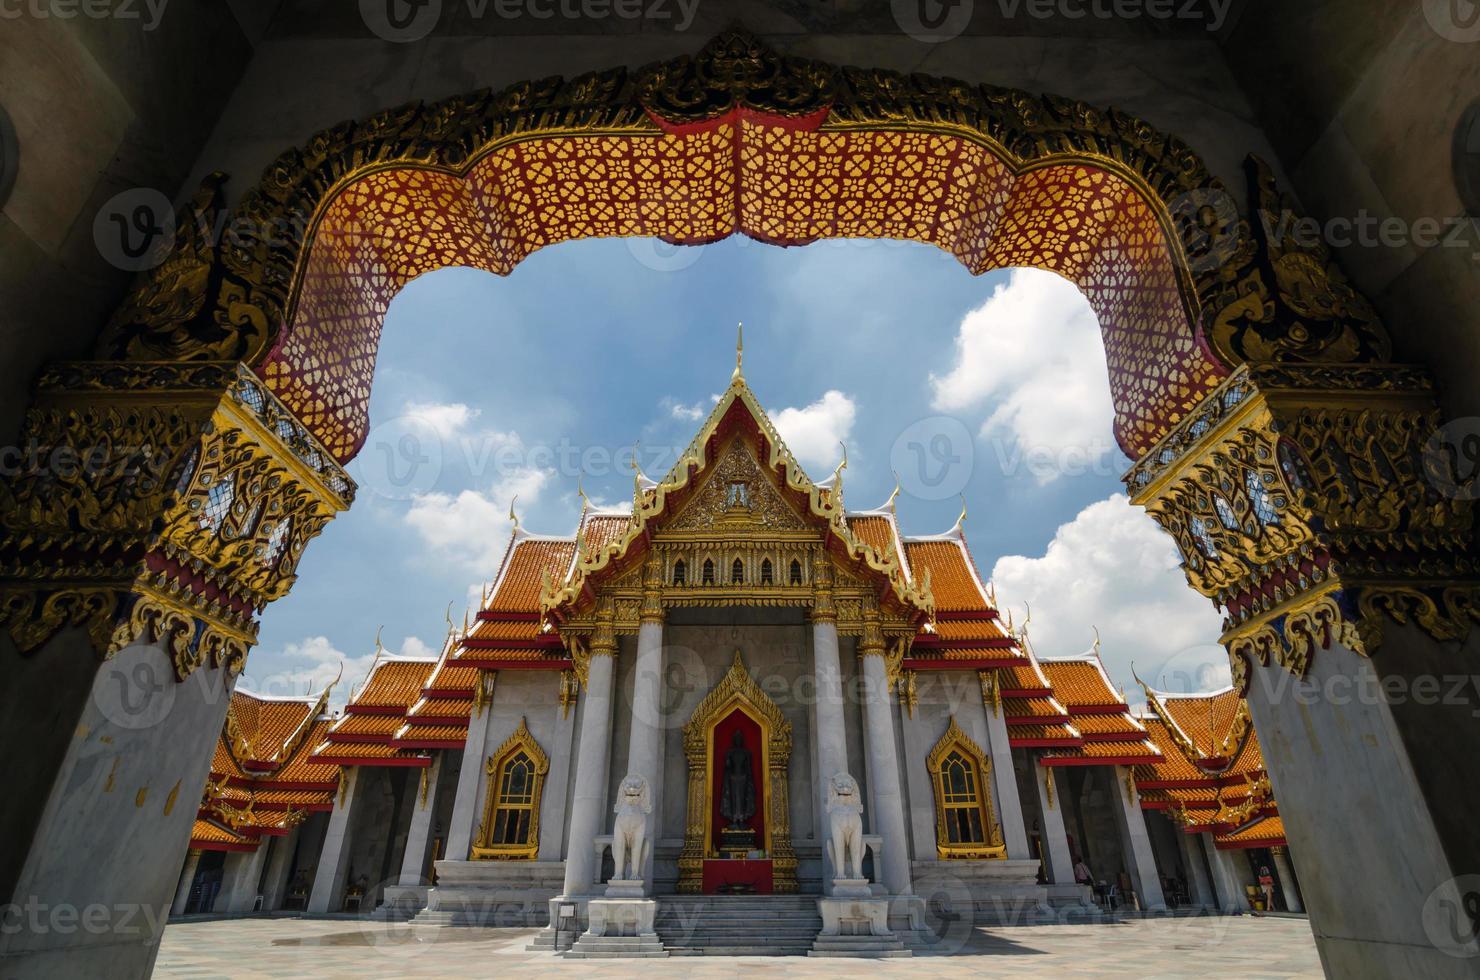 wat benjamabophit-marmortemplet i bangkok, Thailand foto